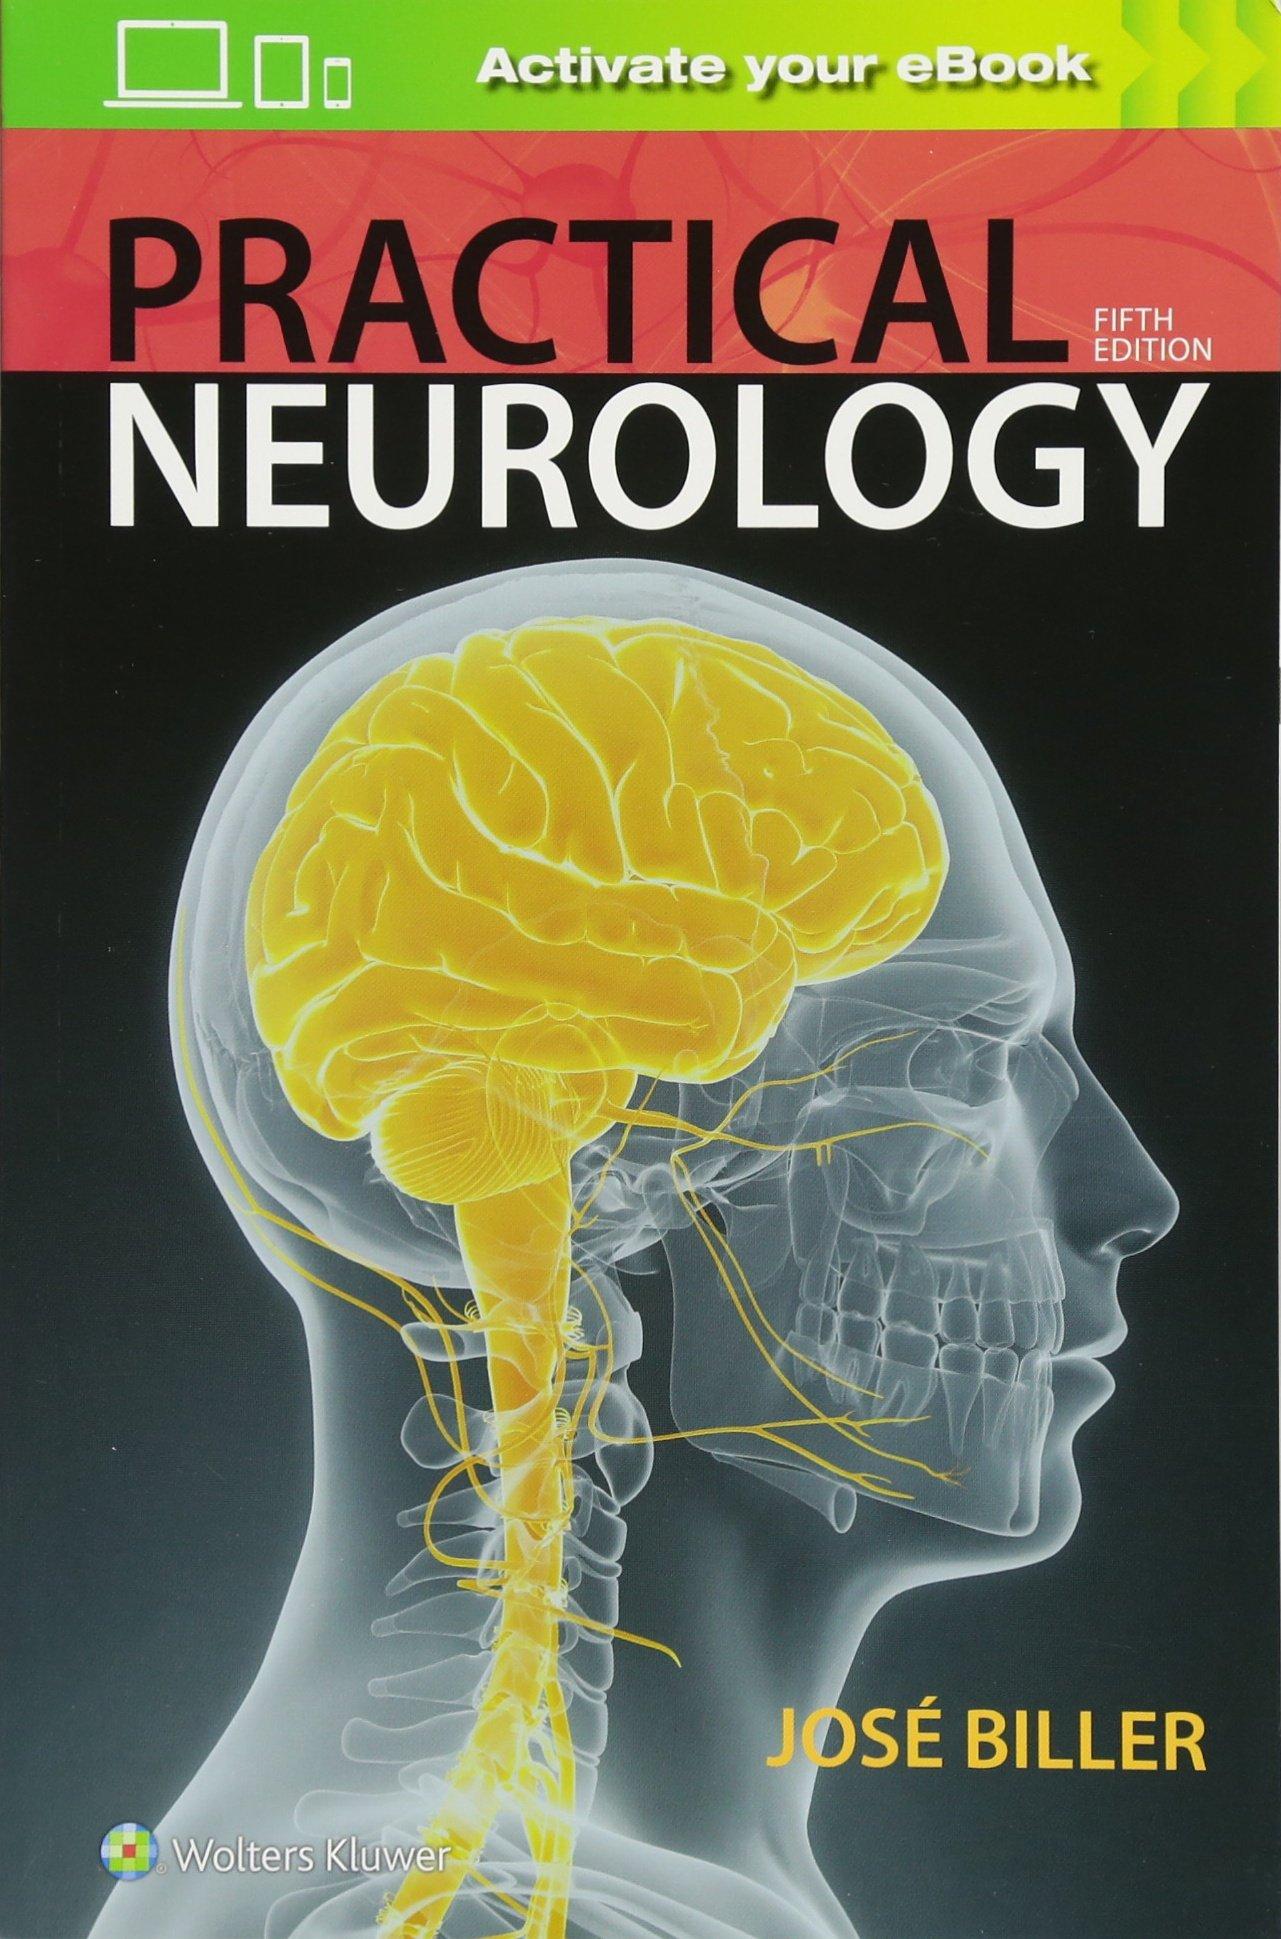 Practical Neurology Amazon De Jose Biller Fremdsprachige Bucher